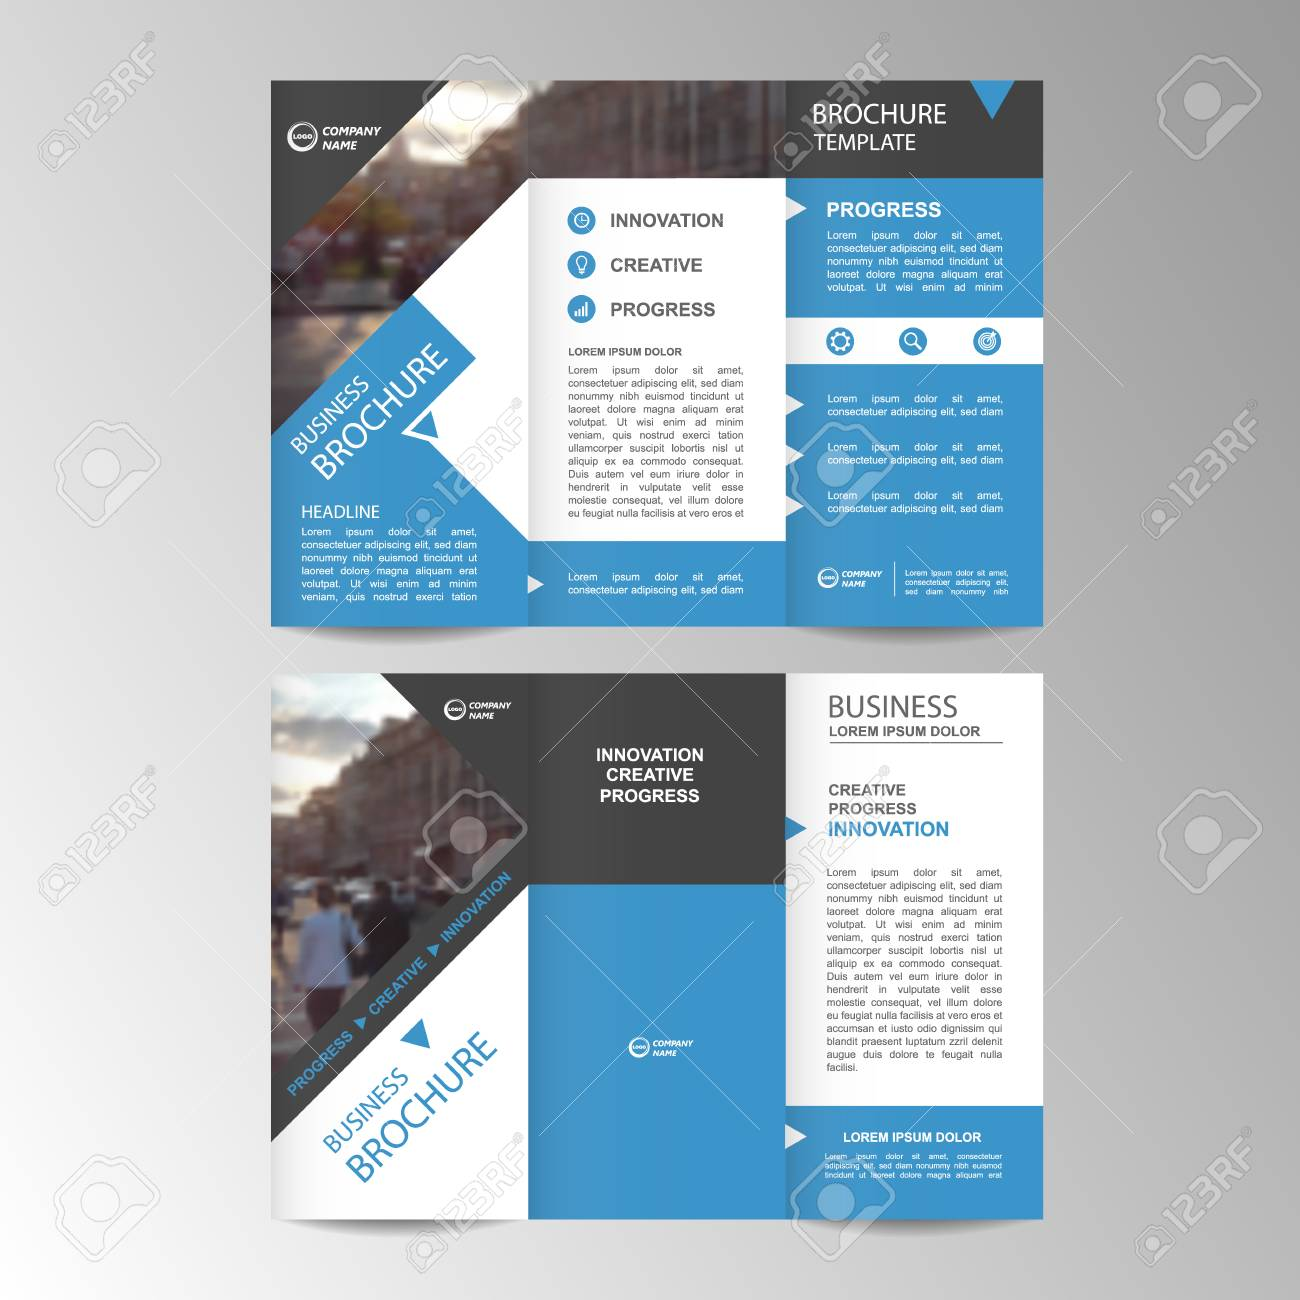 9e42c14d919d9 Foto de archivo - Tríptico geométrico negocios folleto plantilla folleto o  folleto. Conjunto de diseño plano.